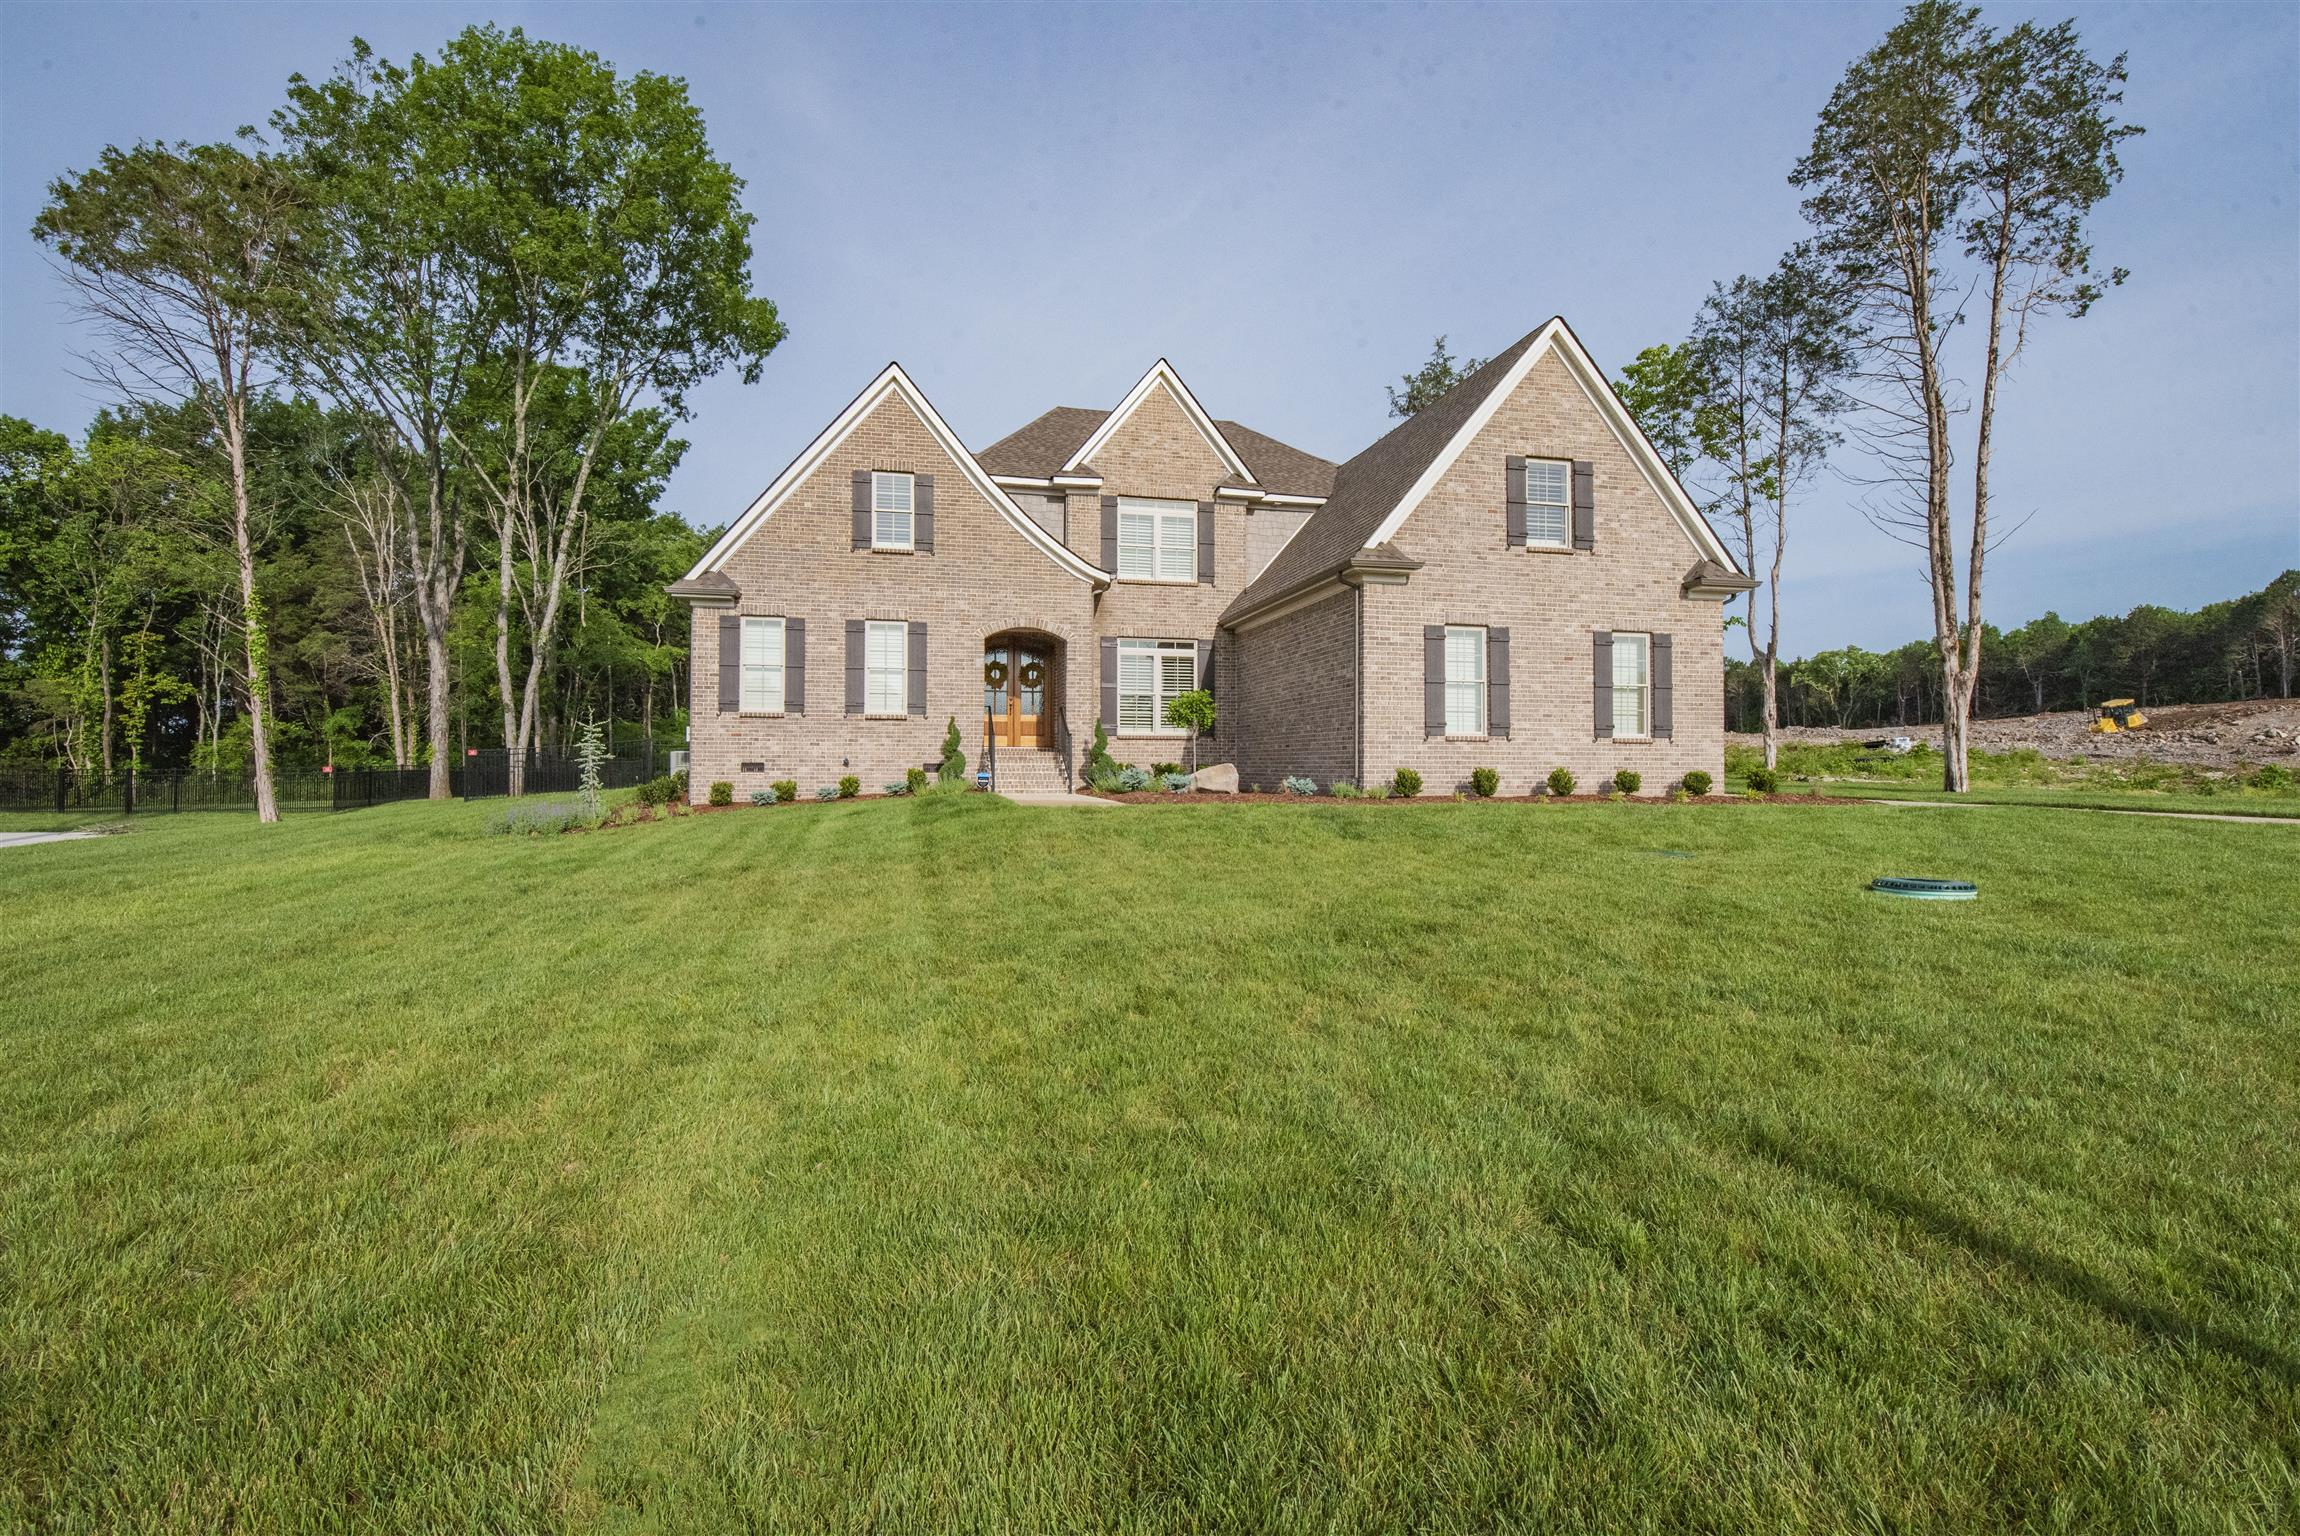 1605 Blueridge Dr, Murfreesboro, TN 37129 - Murfreesboro, TN real estate listing